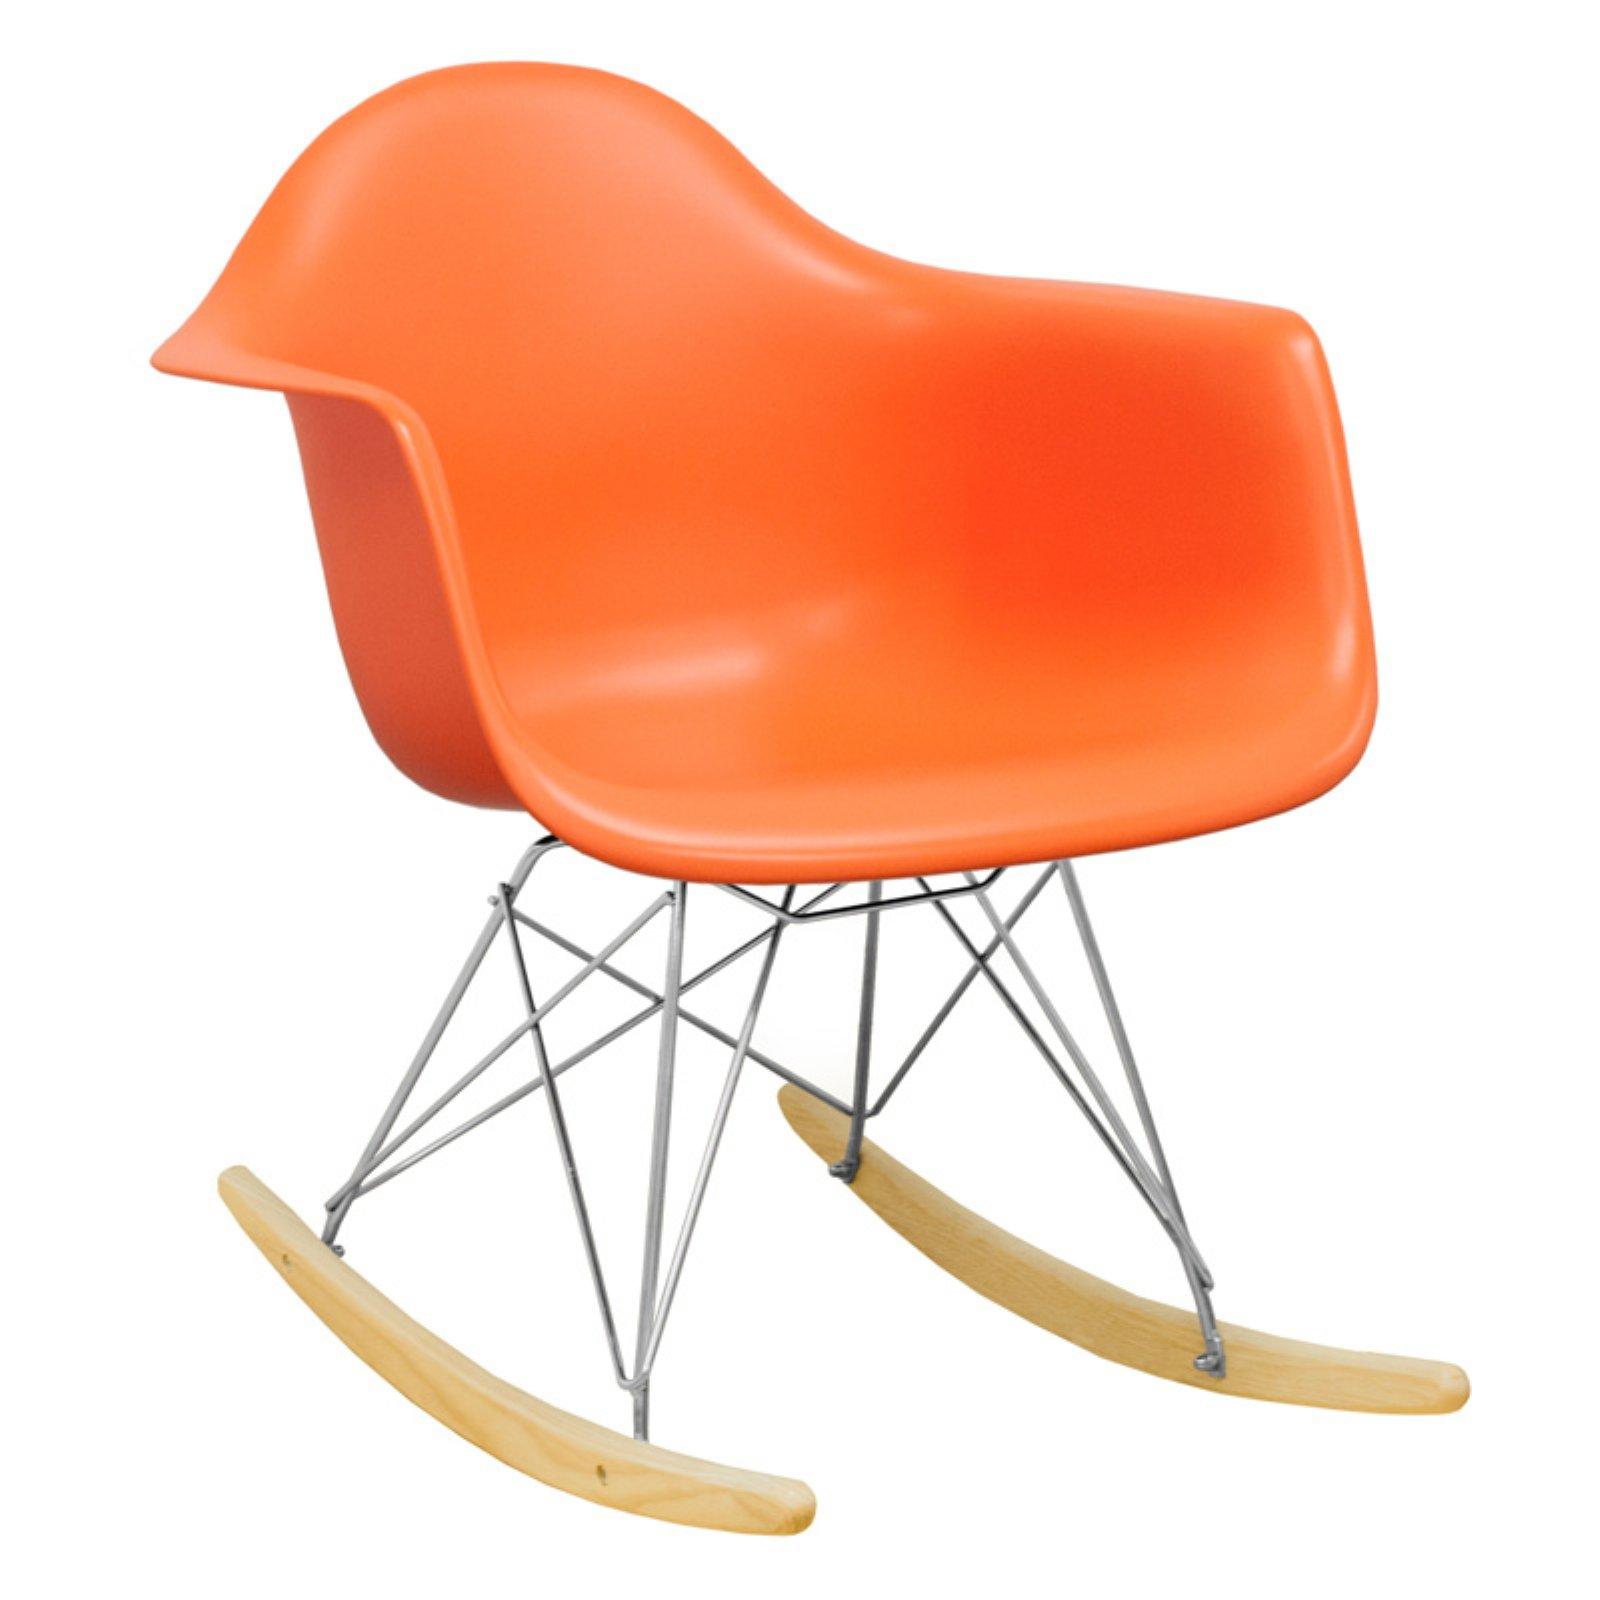 Paris Tower Rocker Lounge Chair (Orange) With Orange Rocking Chairs Lounge Chairs (View 10 of 20)